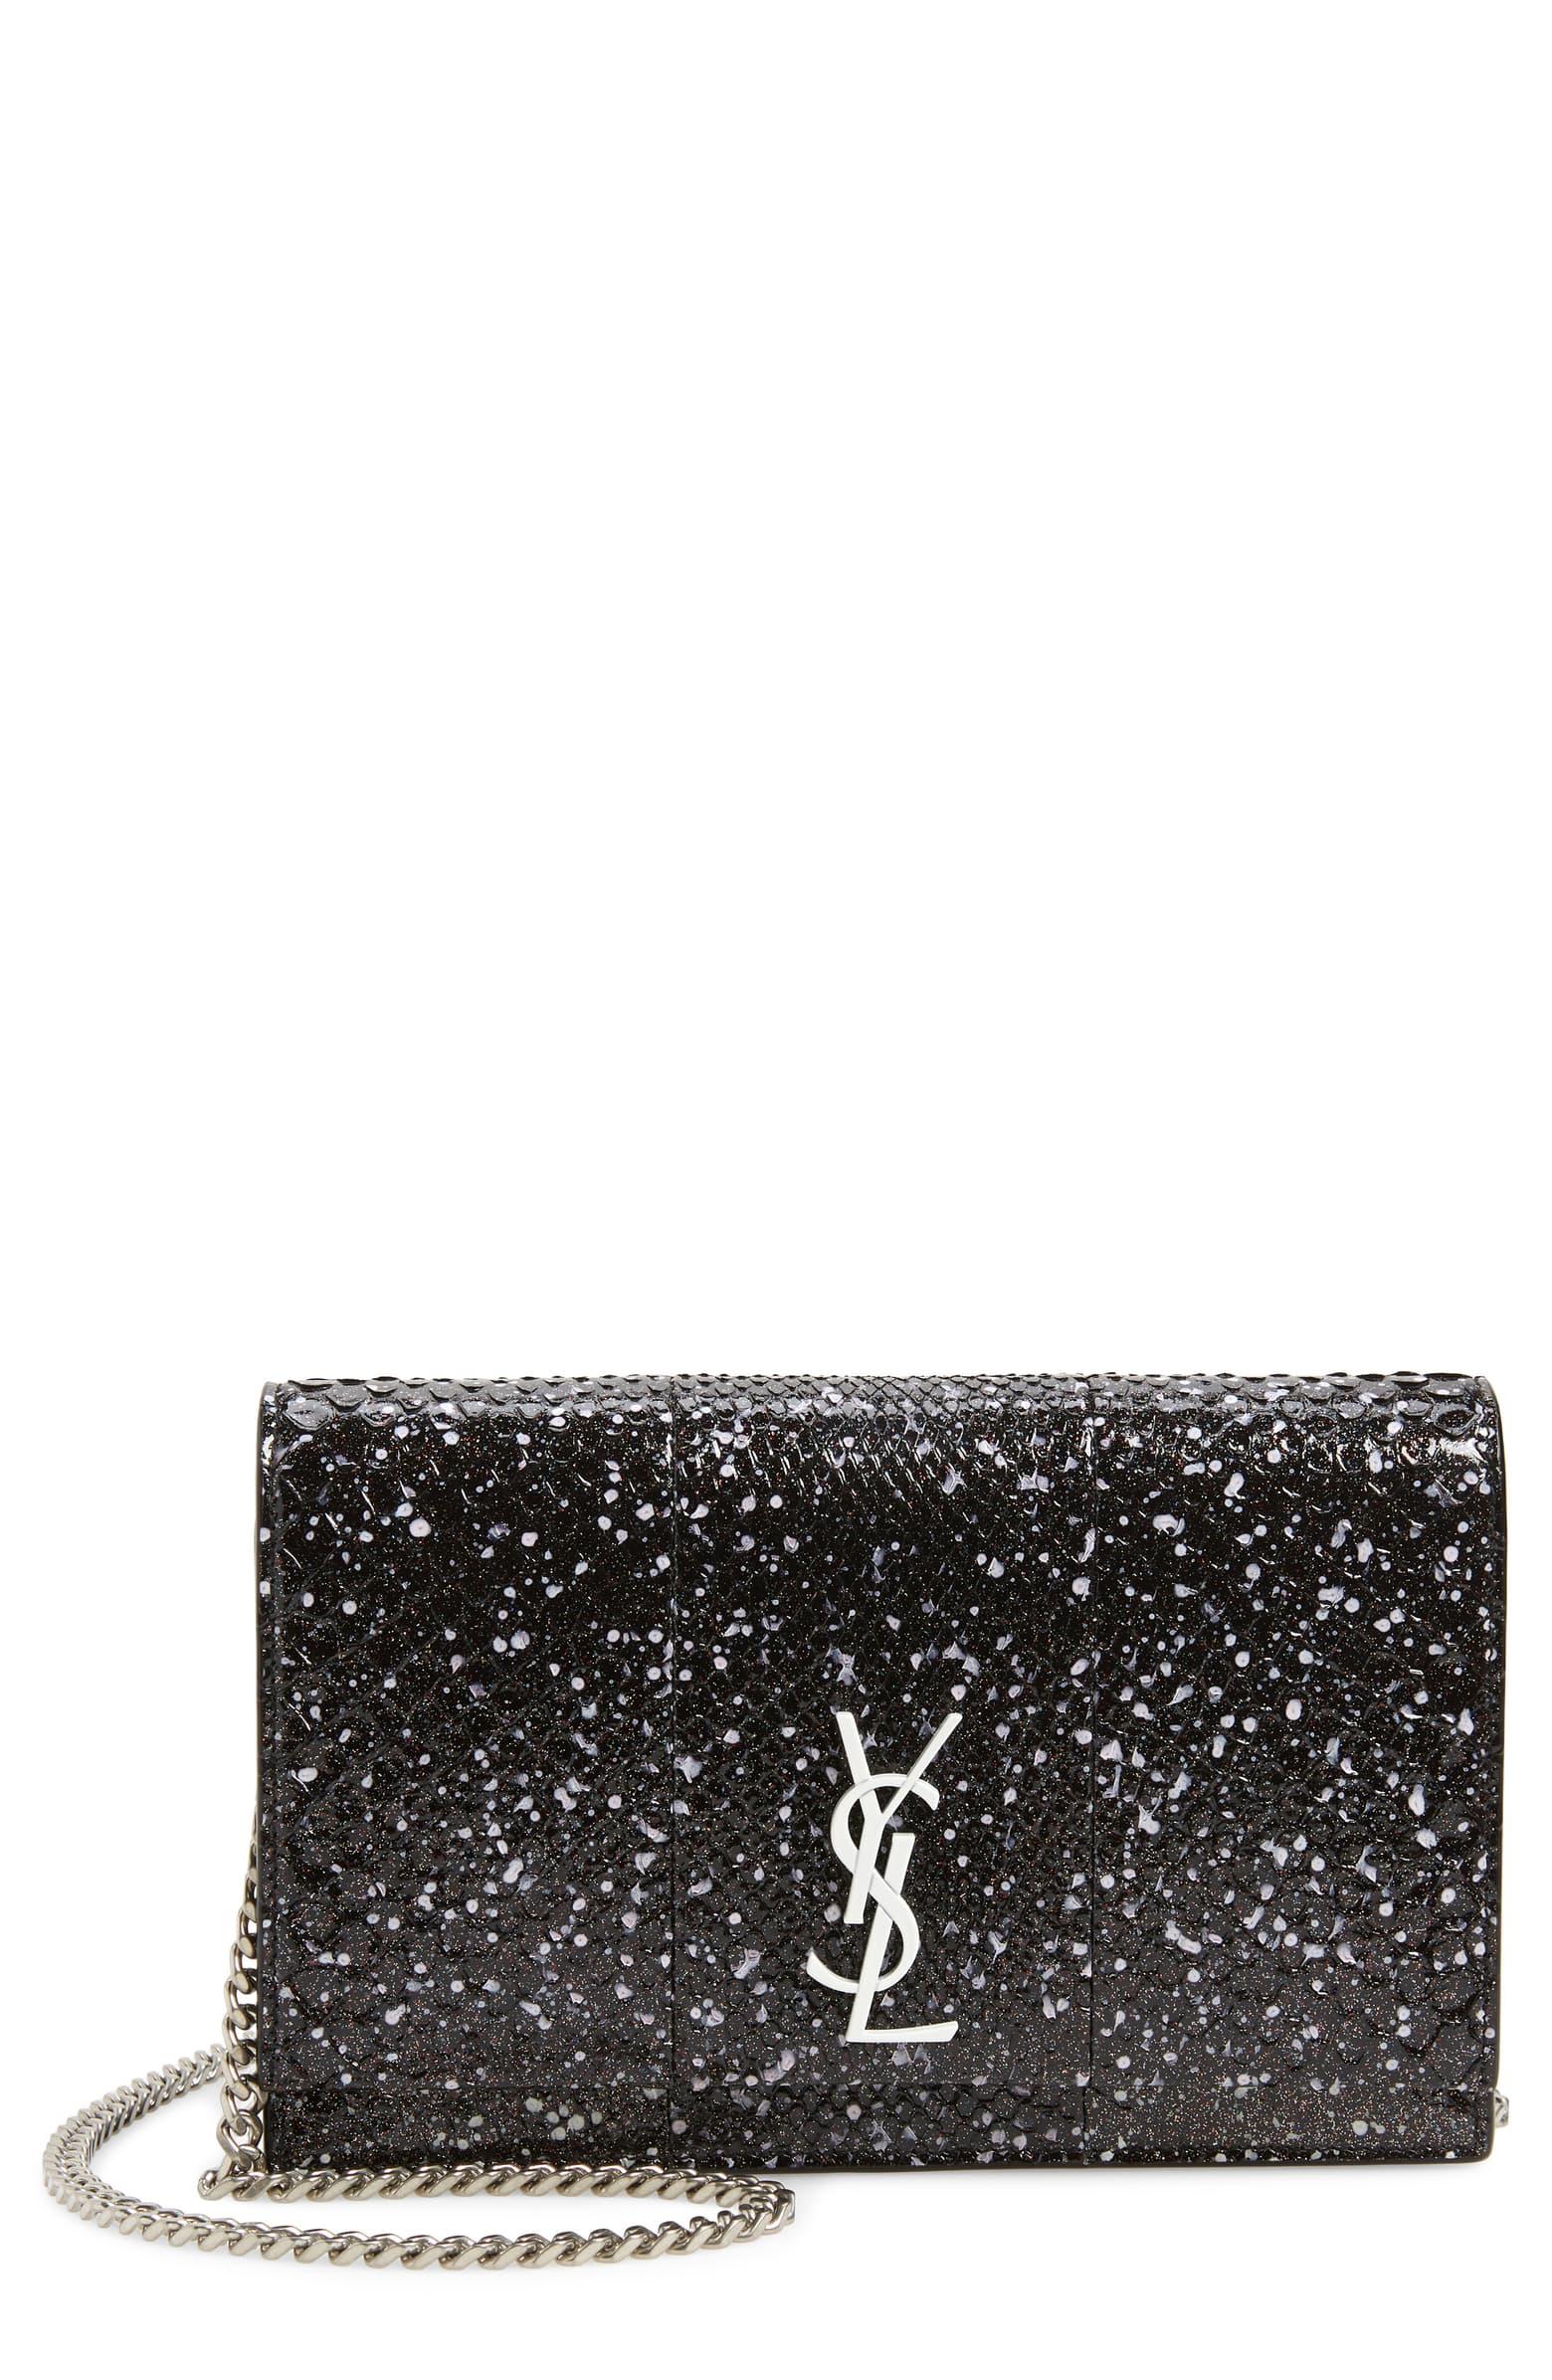 statement-handbag-3